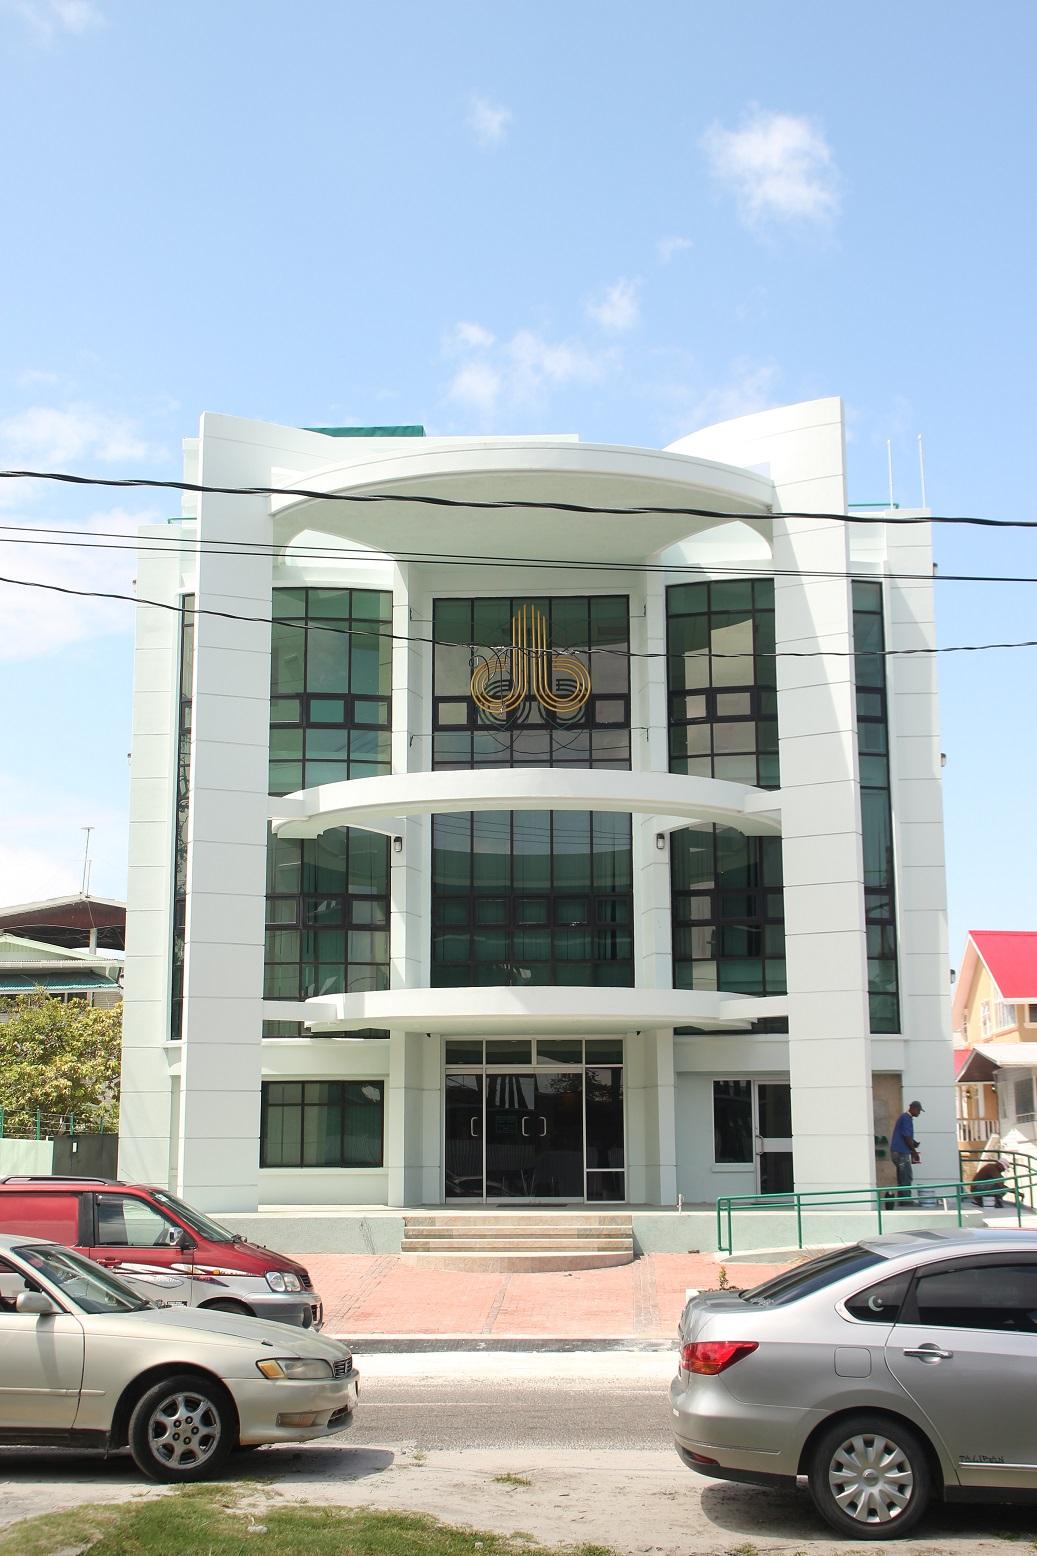 demerara bank Demerara Bank registers $1.7B profit – Stabroek News